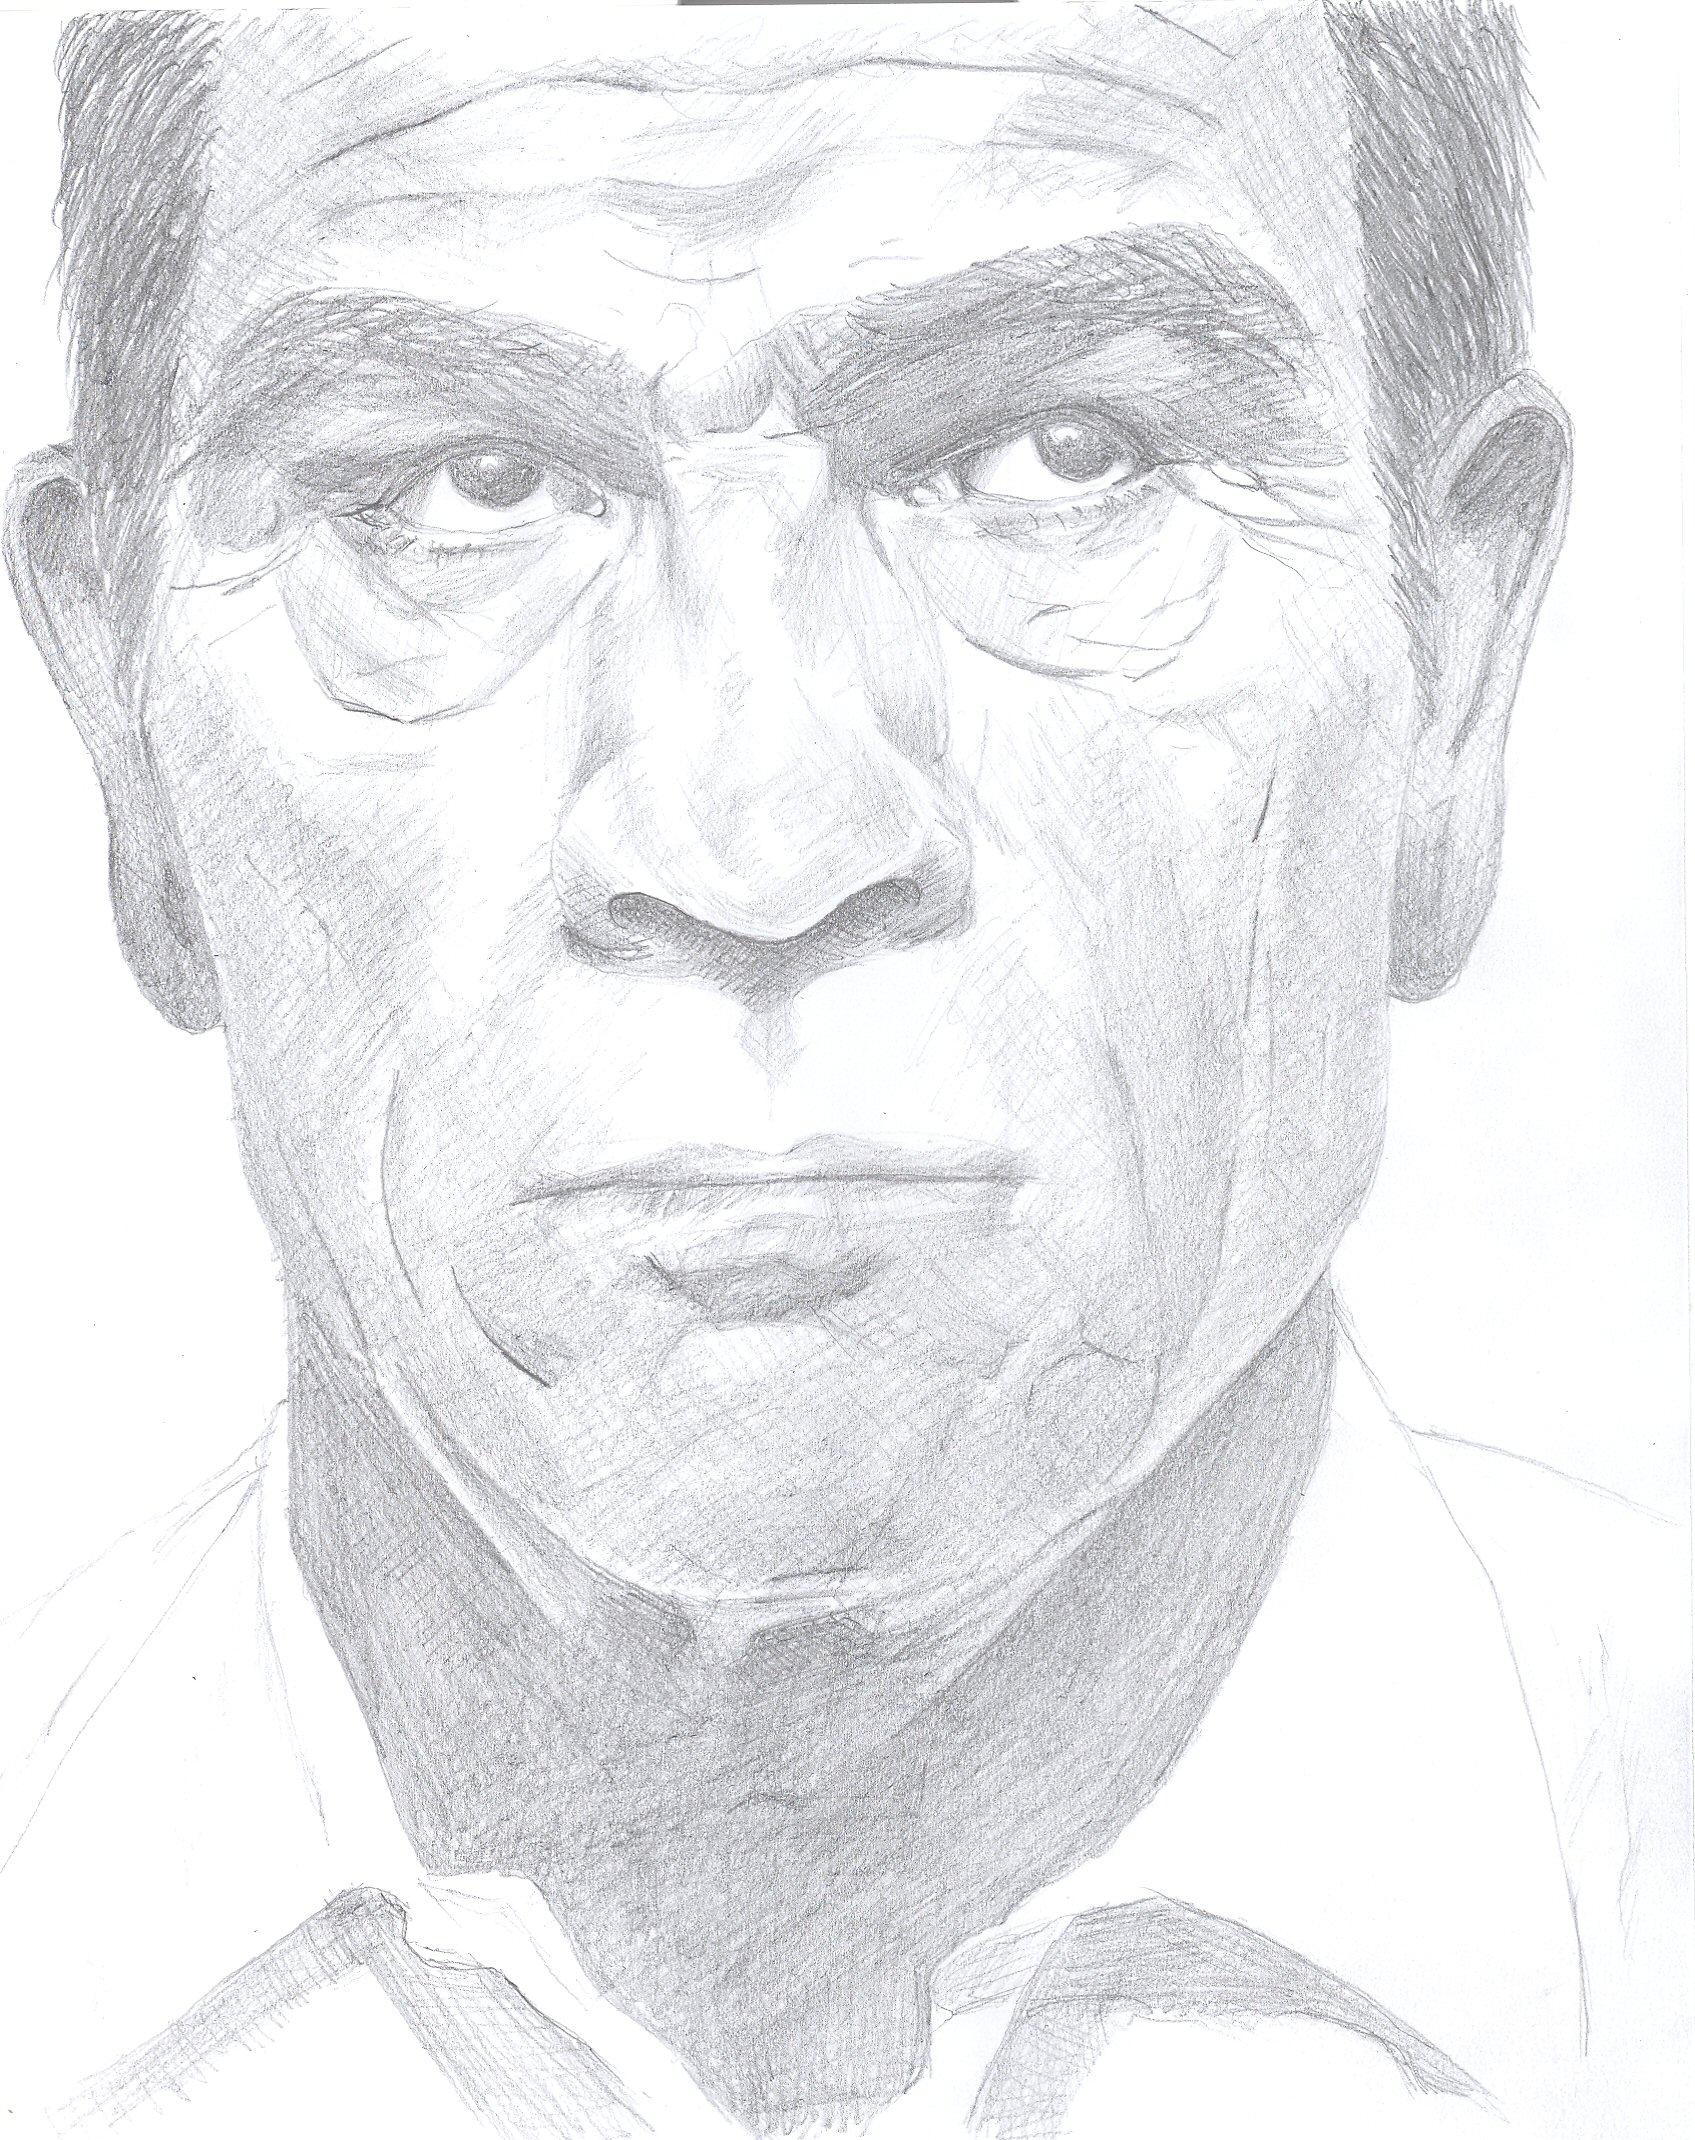 Cmo dibujar rostros humanos con arrugas  eHow en Espaol